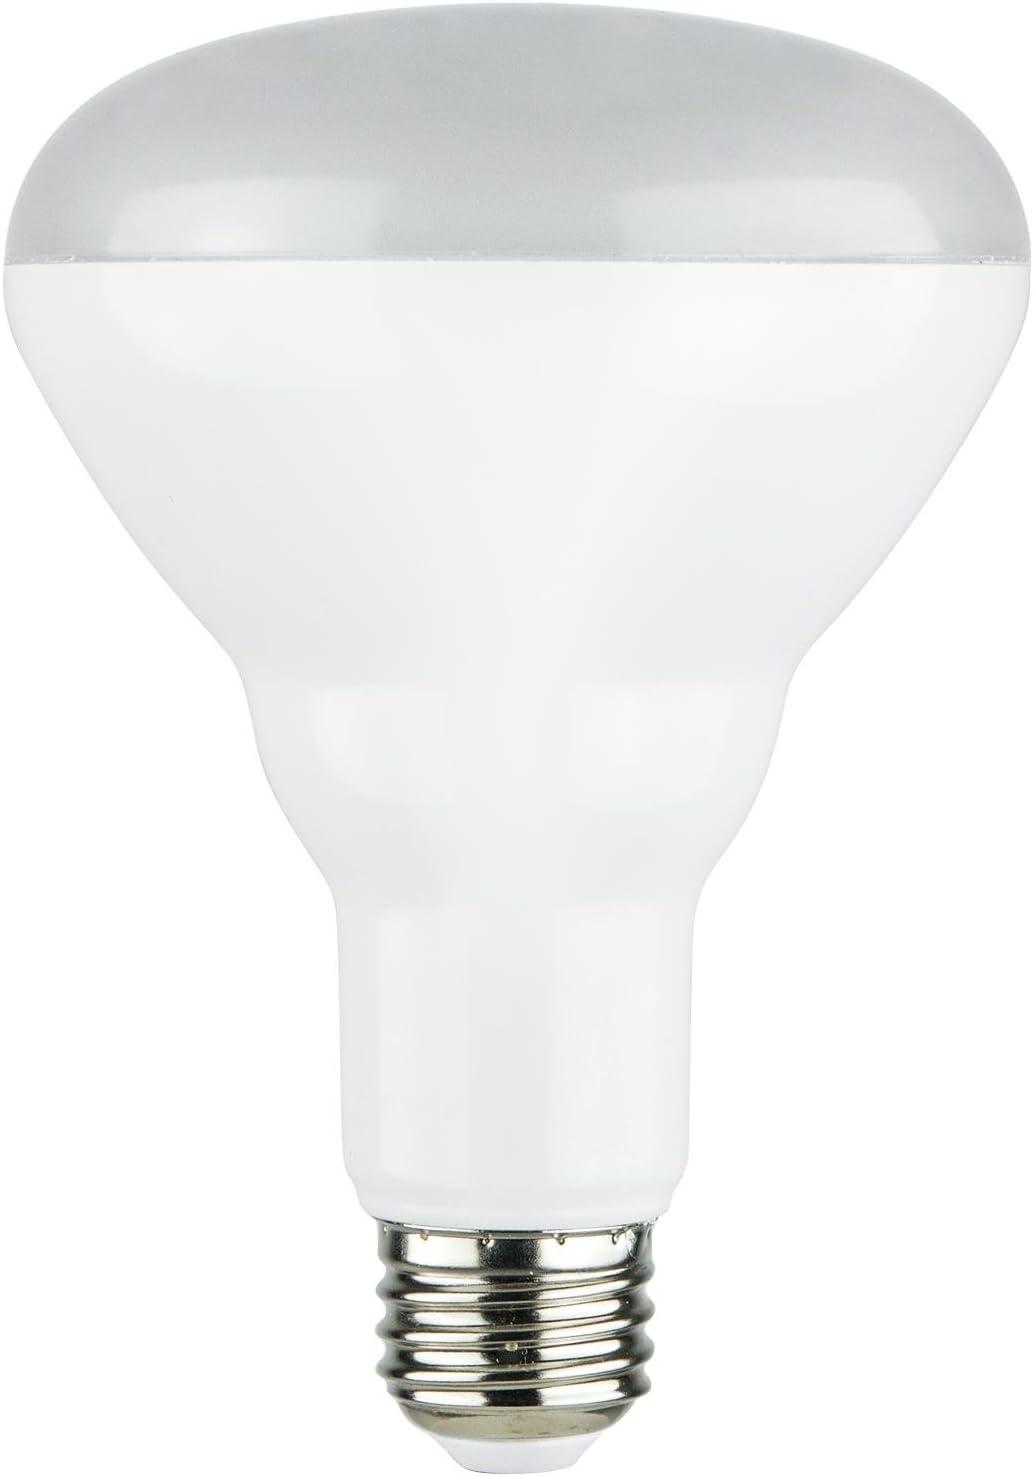 9 Watts E26 Warm White Medium Base 30K Sunlite 82036-SU LED 90 CRI BR30 Reflector Light Bulb Dimmable Energy Star Certified 650 Lumens 6 Pack ETL Listed 65W Equivalent